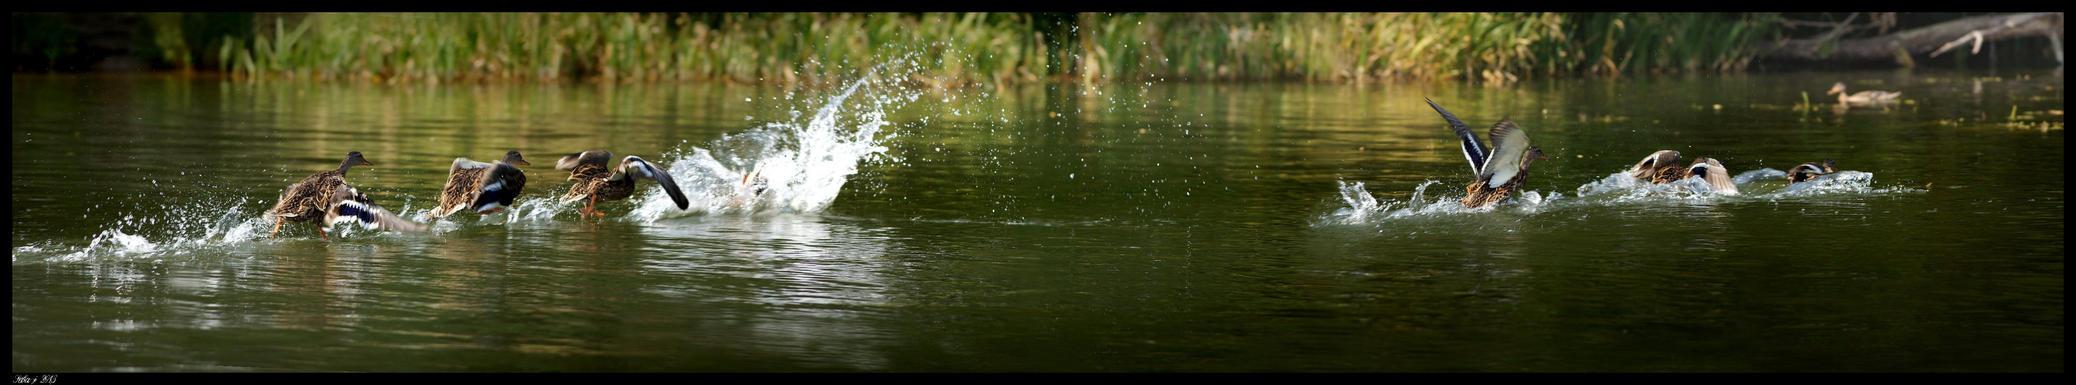 Duck panorama by seba-j